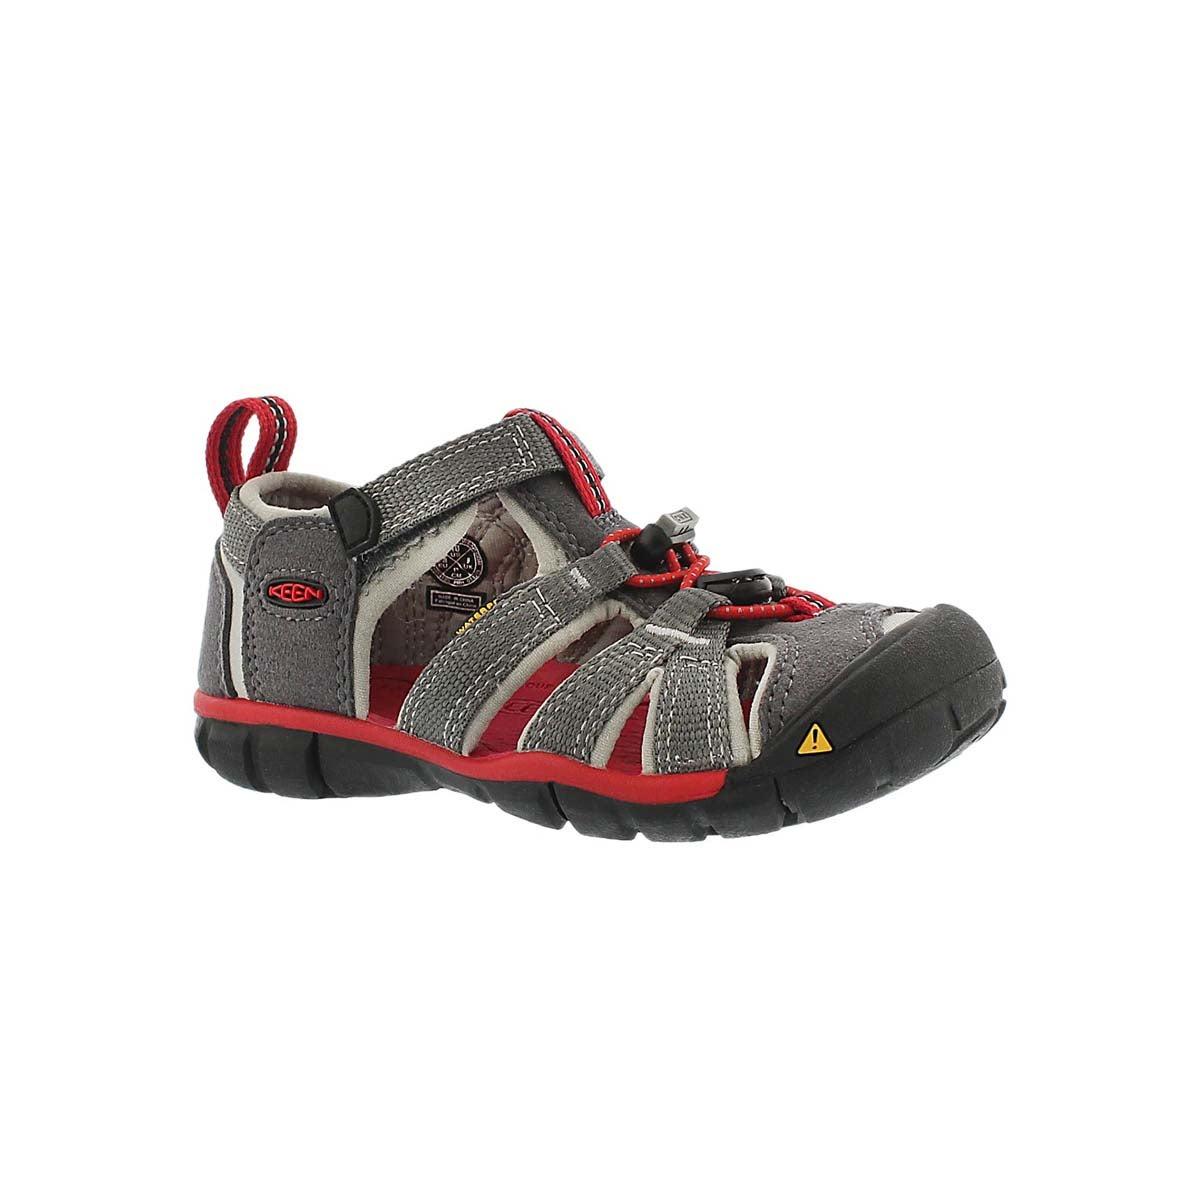 Infs-b Seacamp II grey/red sport sandal